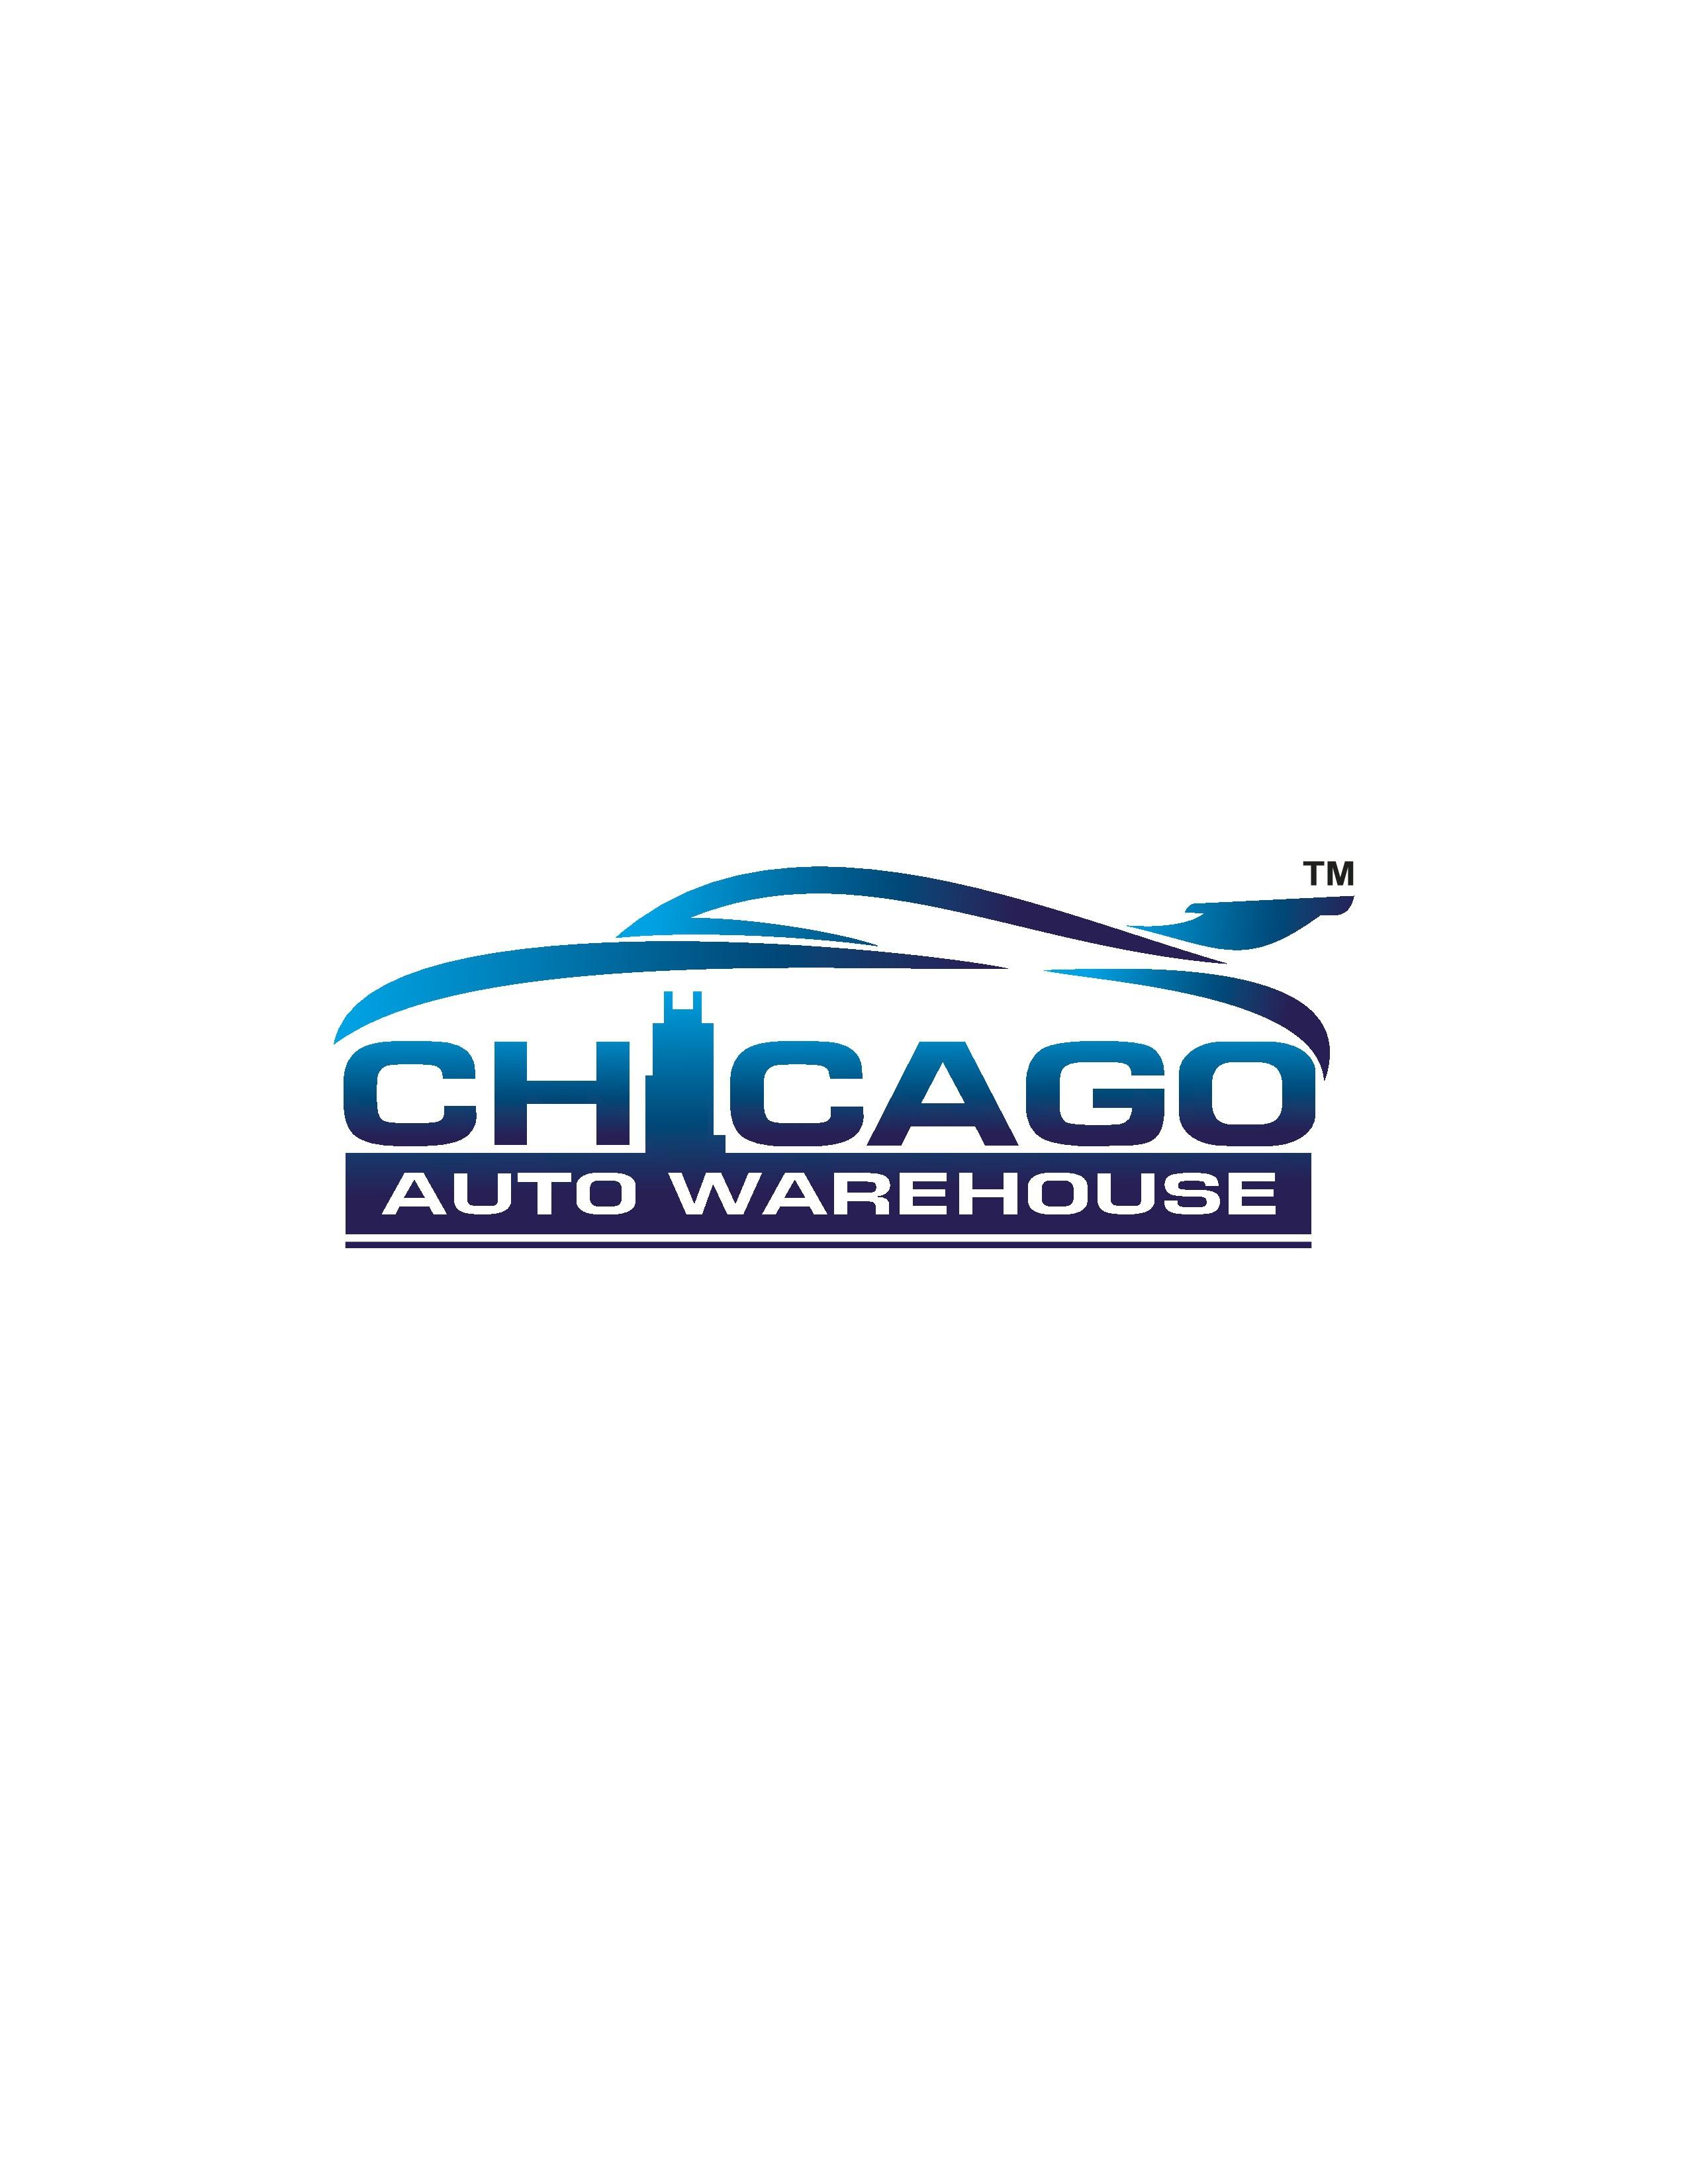 Chicago Used Car Dealership - Modern Logo